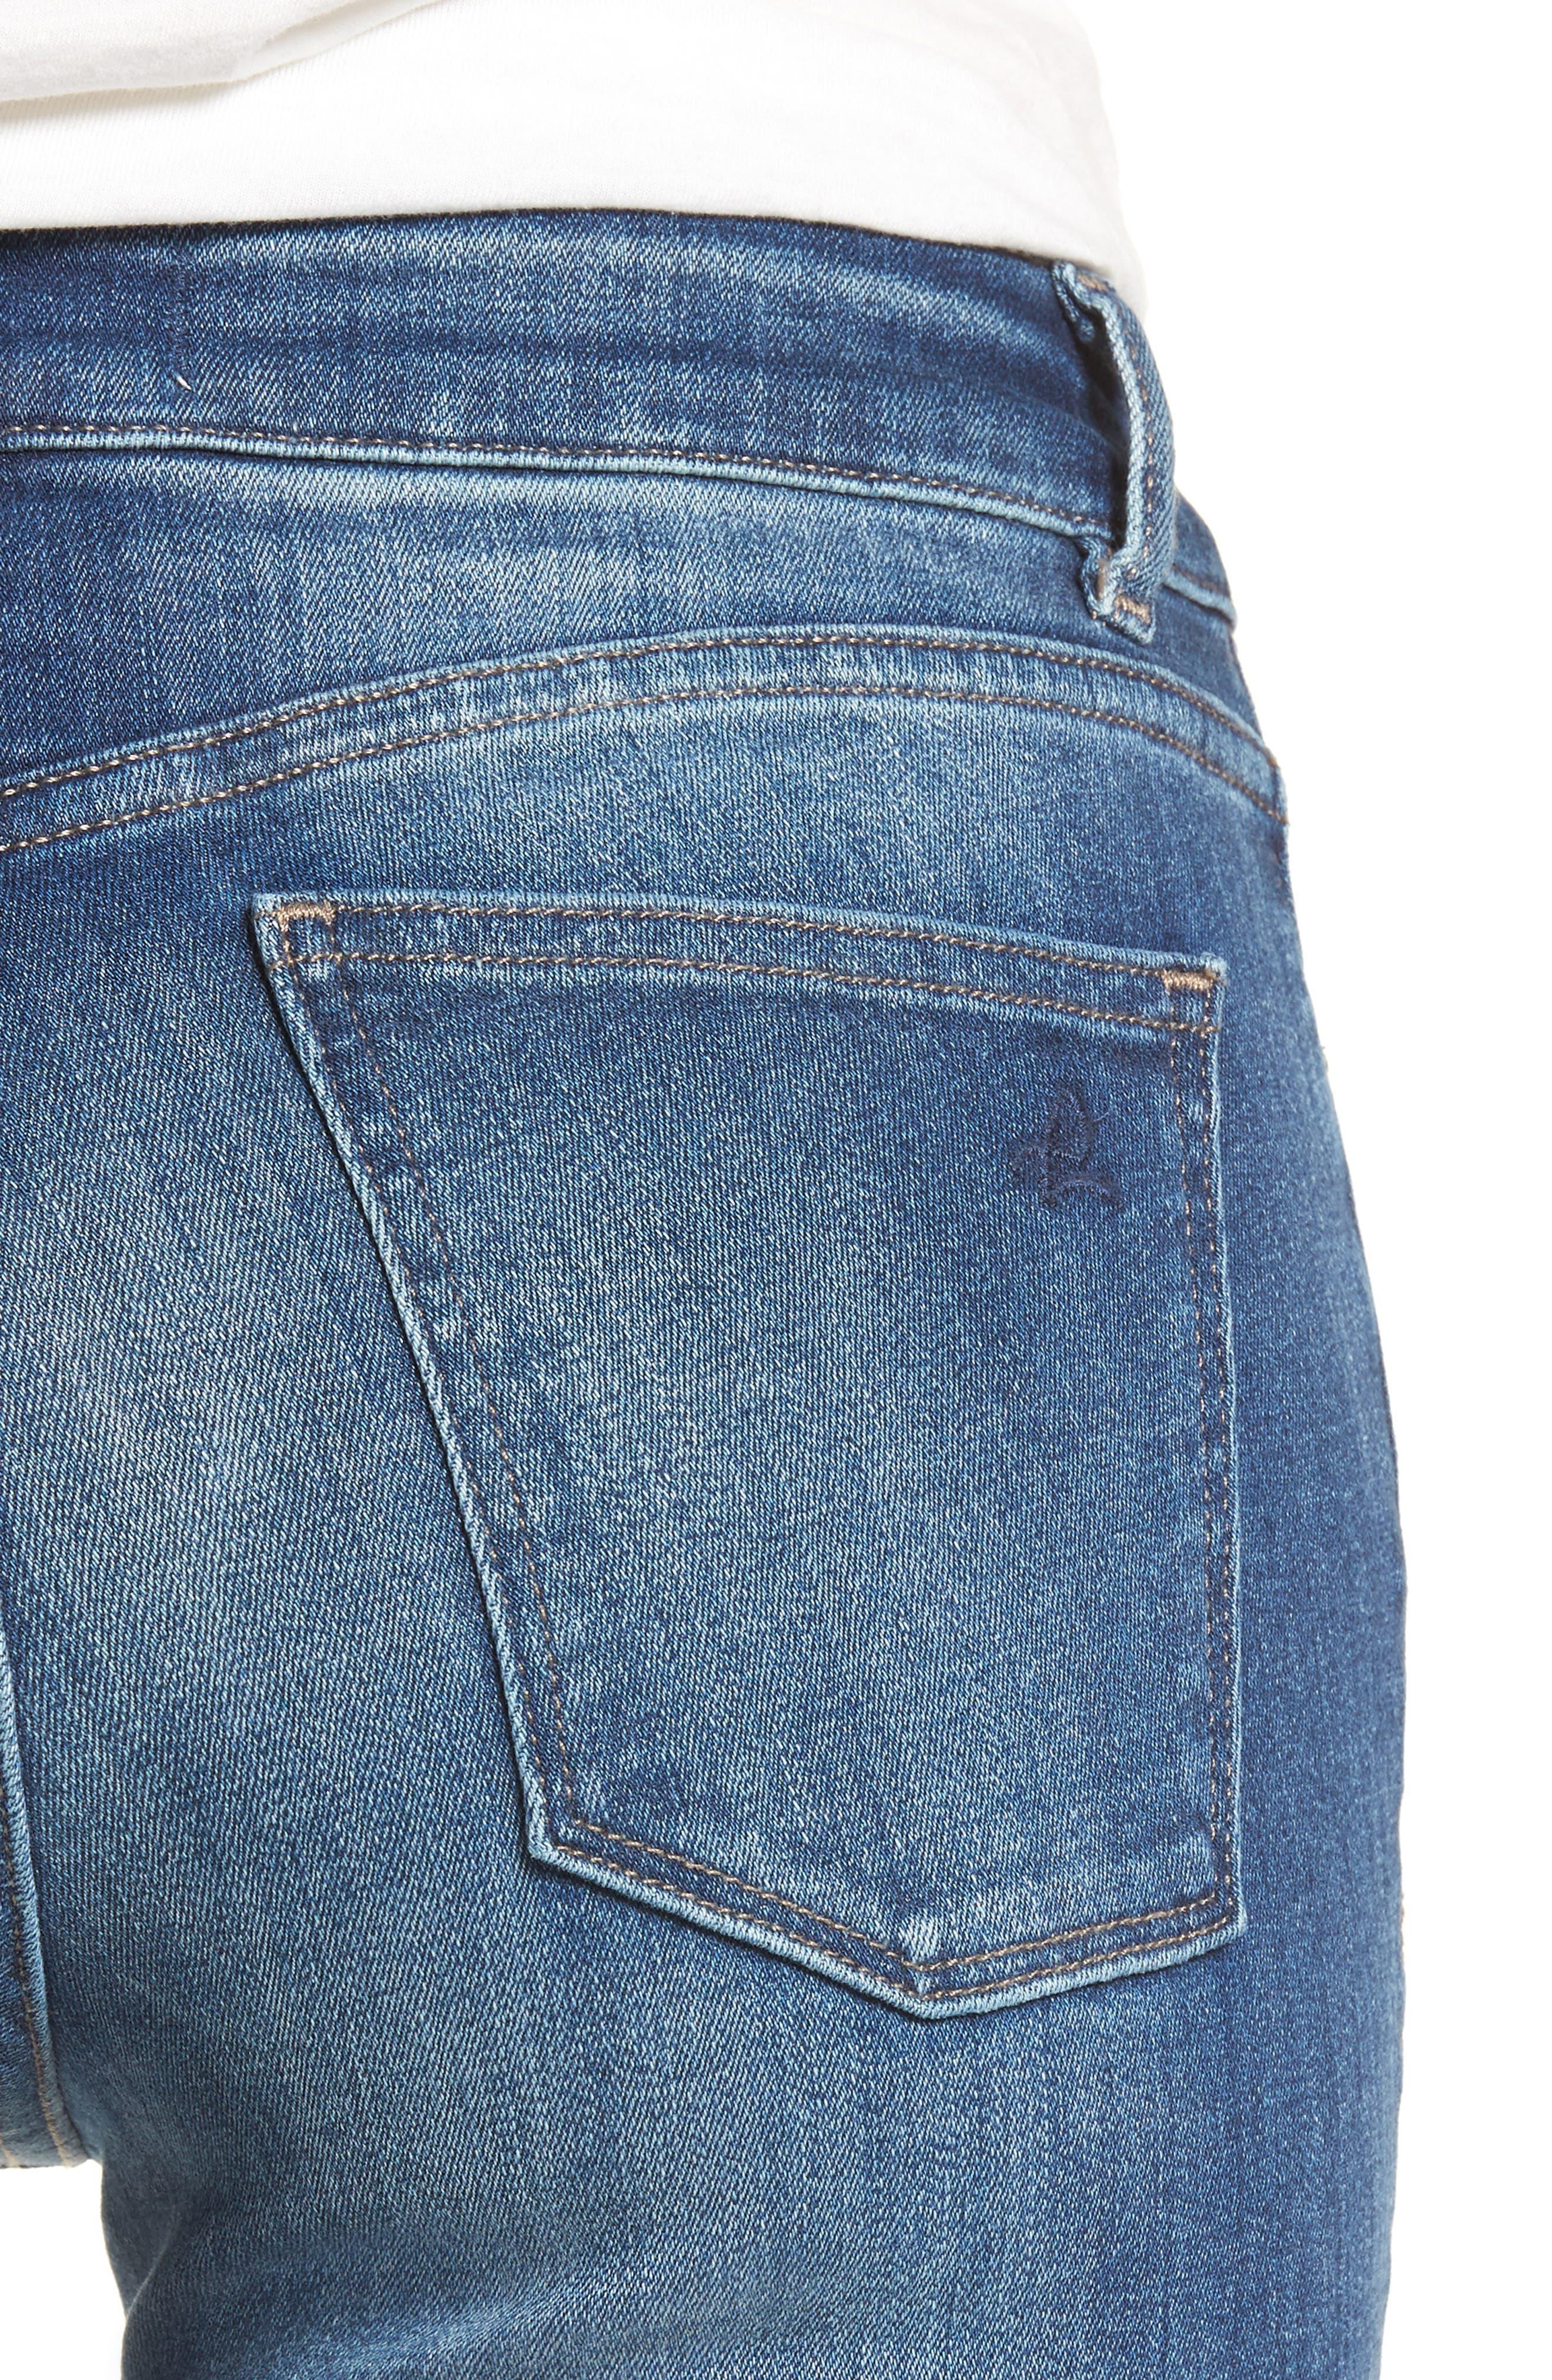 Mara Straight Leg Jeans,                             Alternate thumbnail 4, color,                             Spring Lake